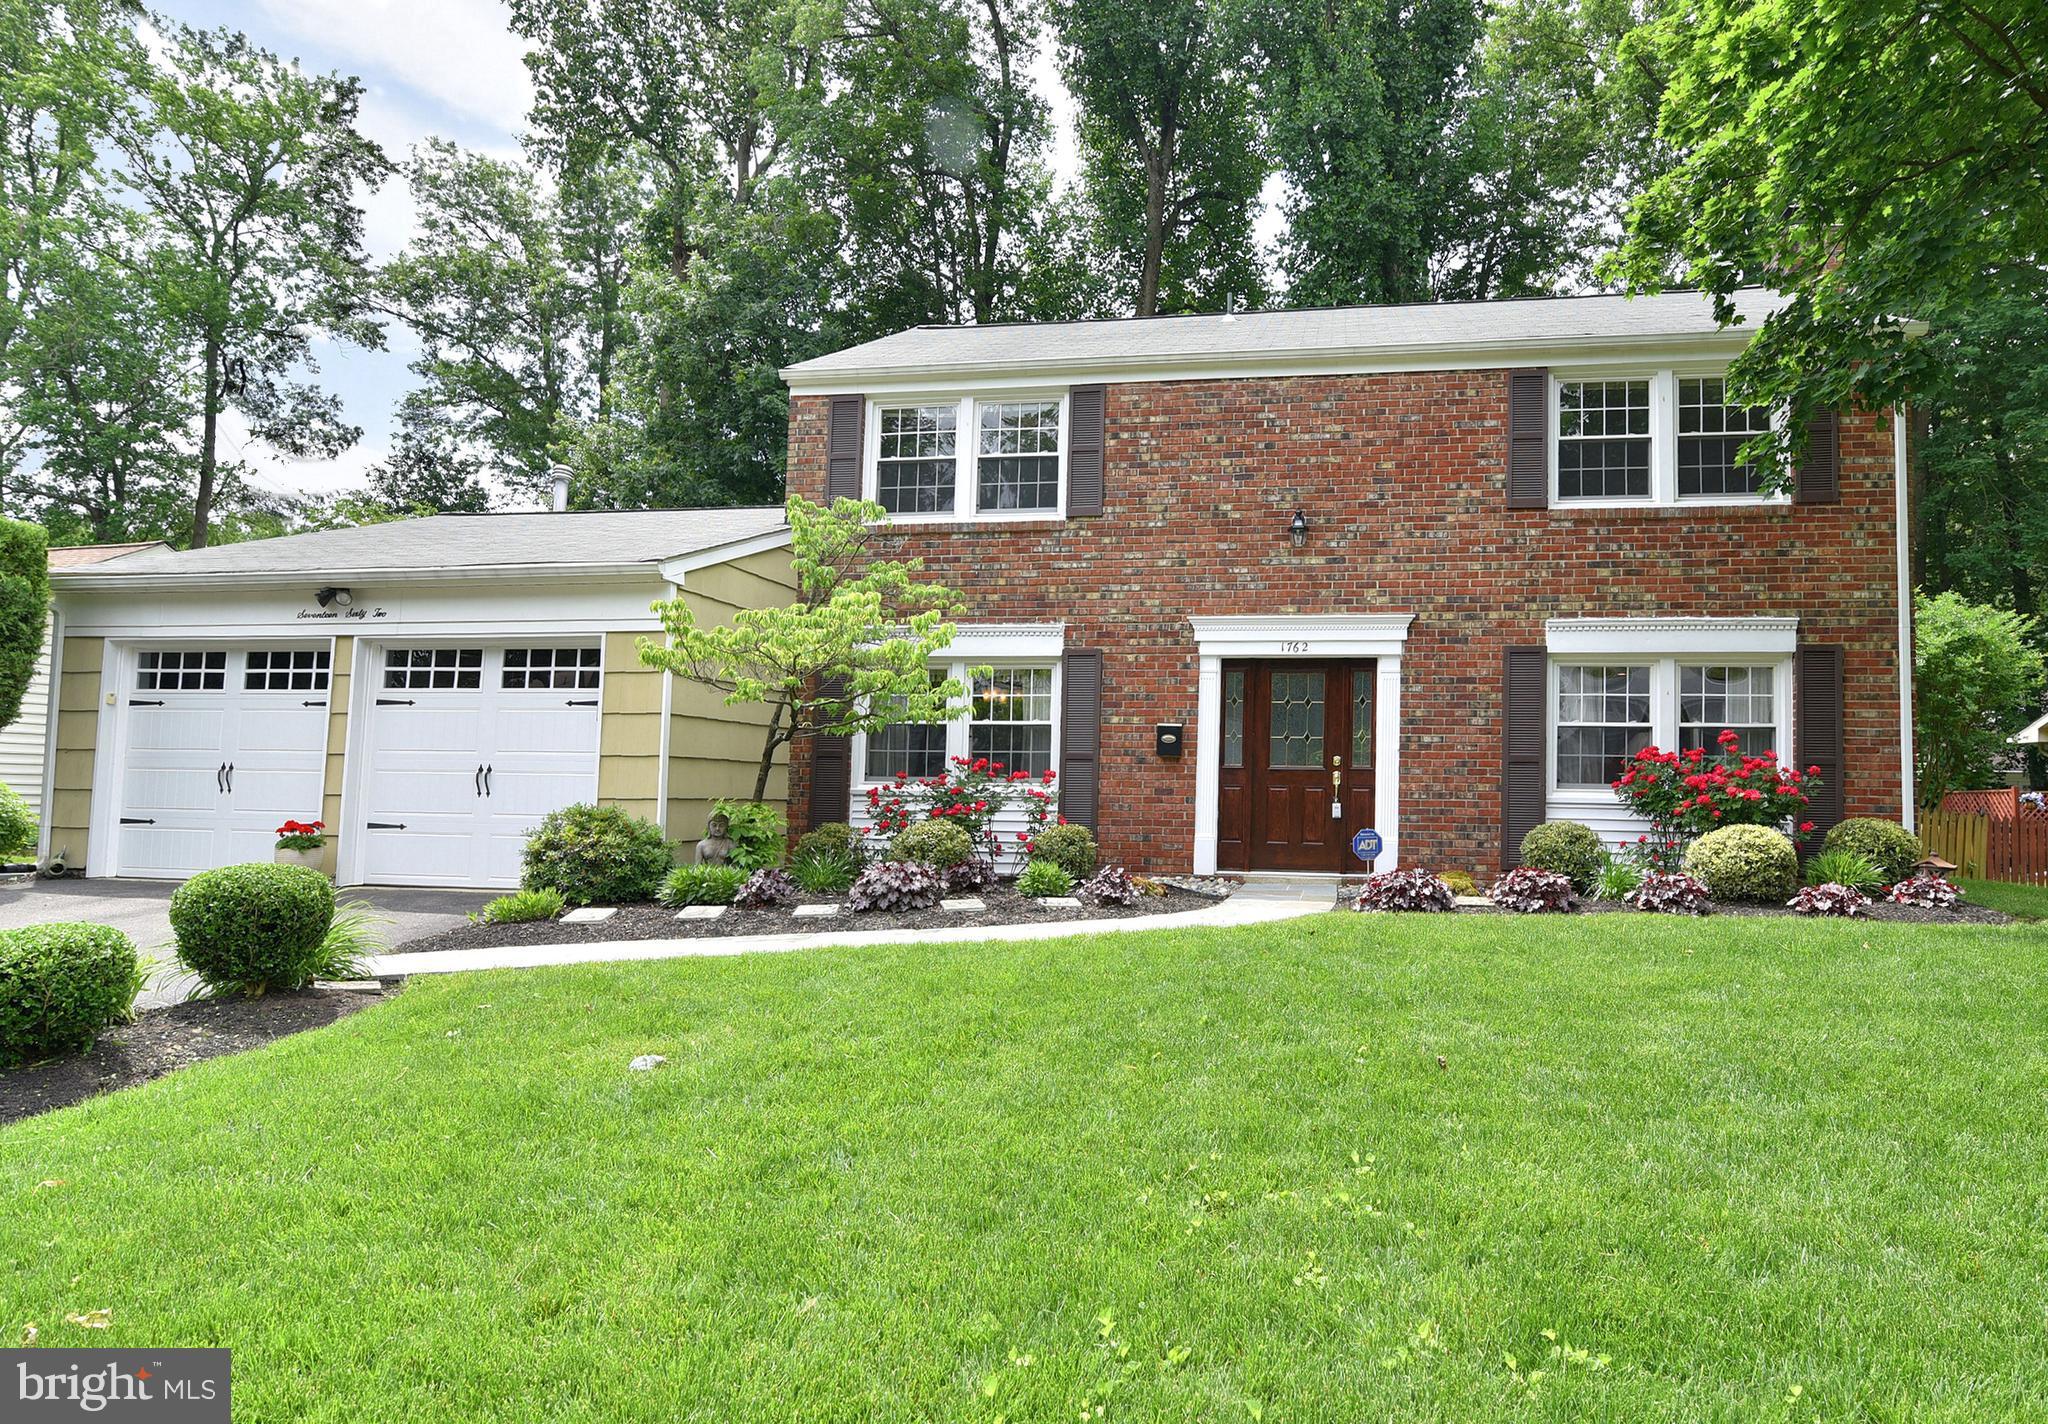 1762 Shaftsbury Ave, Crofton, MD, 21114